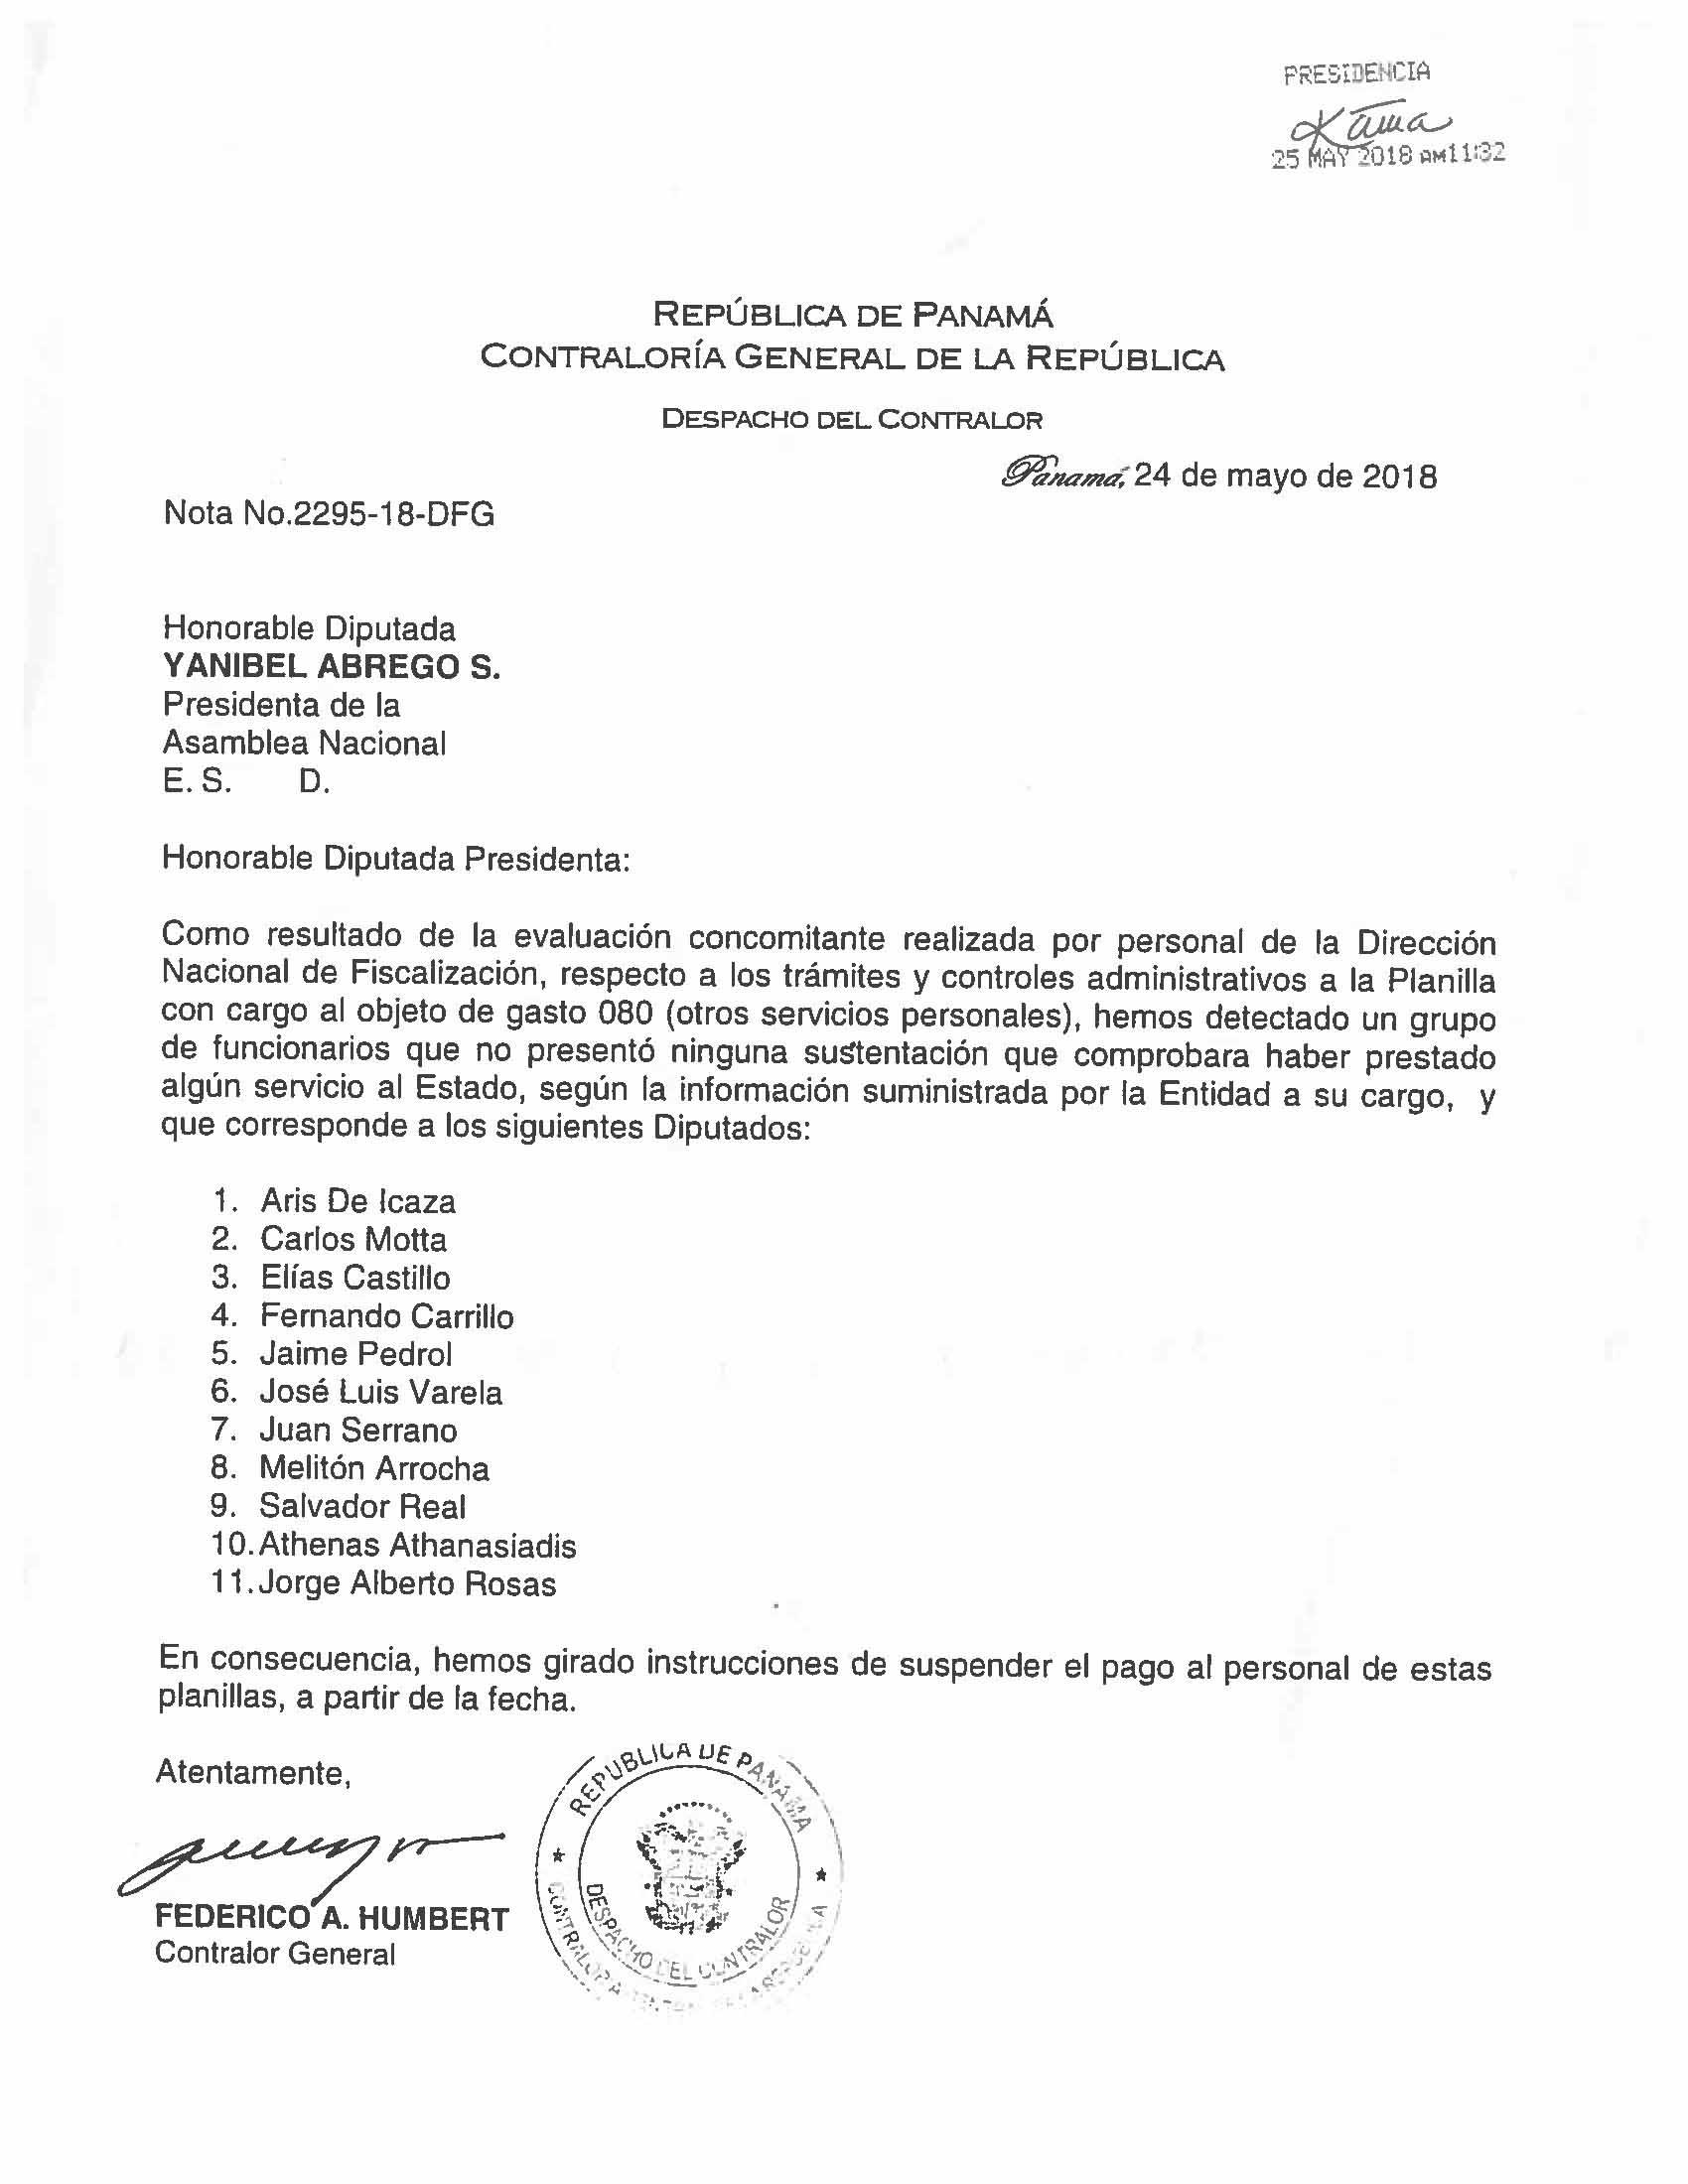 contraloria-suspende-pago-planilla-080-11-diputados